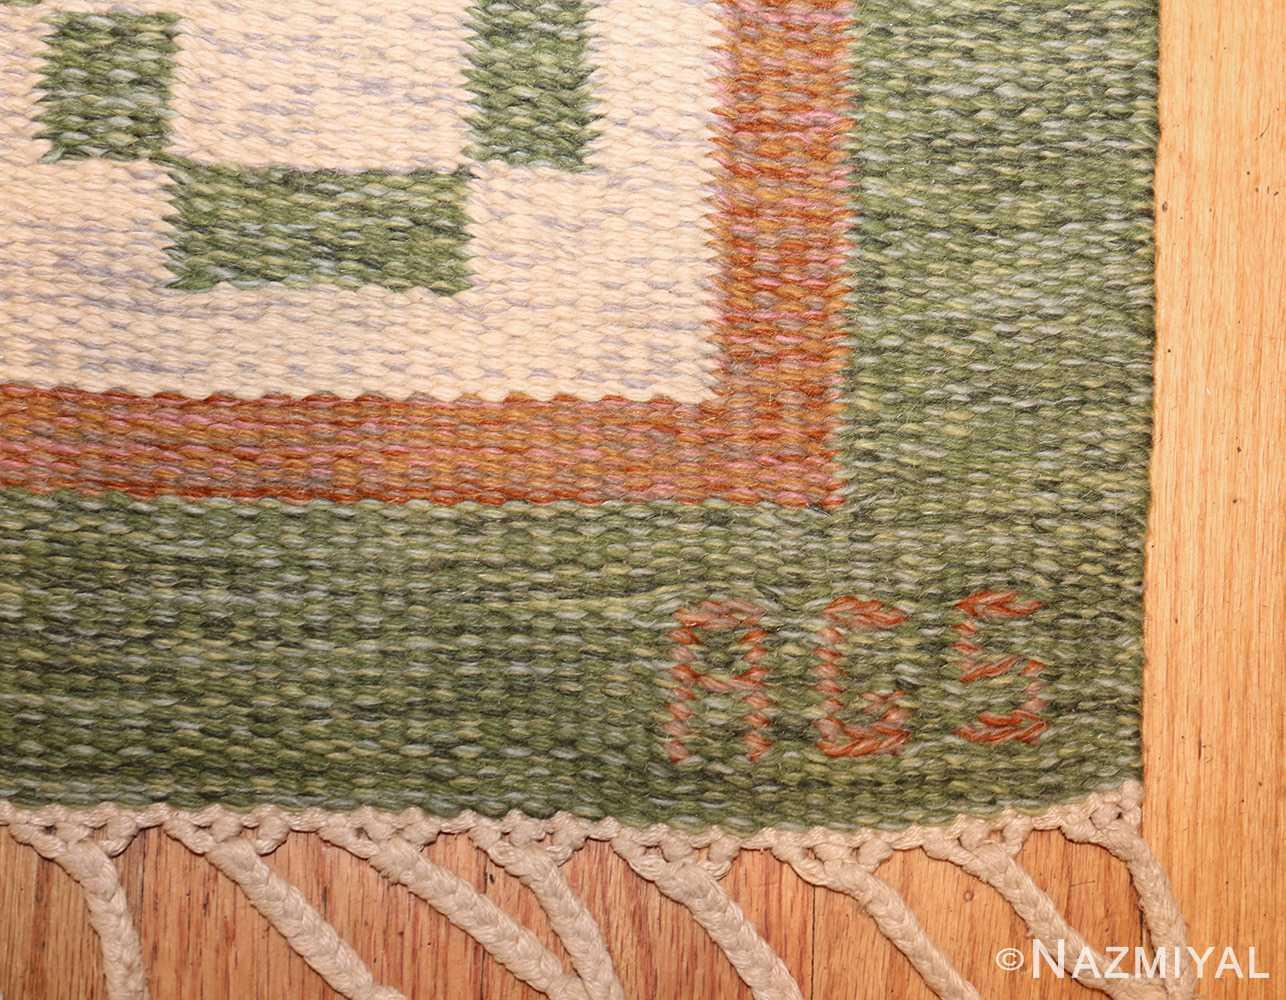 vintage flat woven green swedish scandinavian kilim rug 48990 signature Nazmiyal